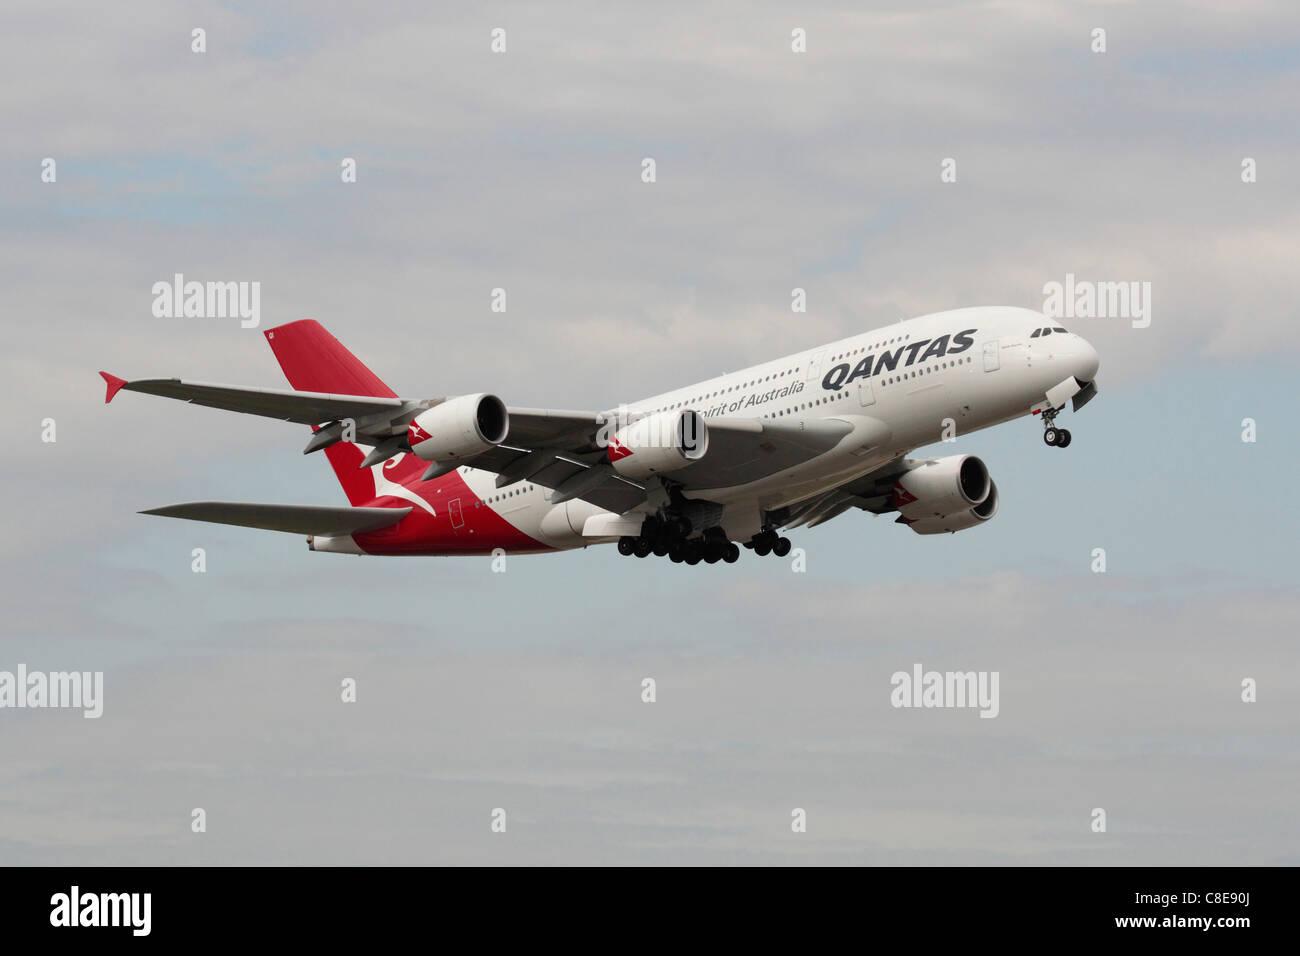 Qantas Airbus A380 superjumbo departing from Heathrow on a long haul intercontinental flight - Stock Image